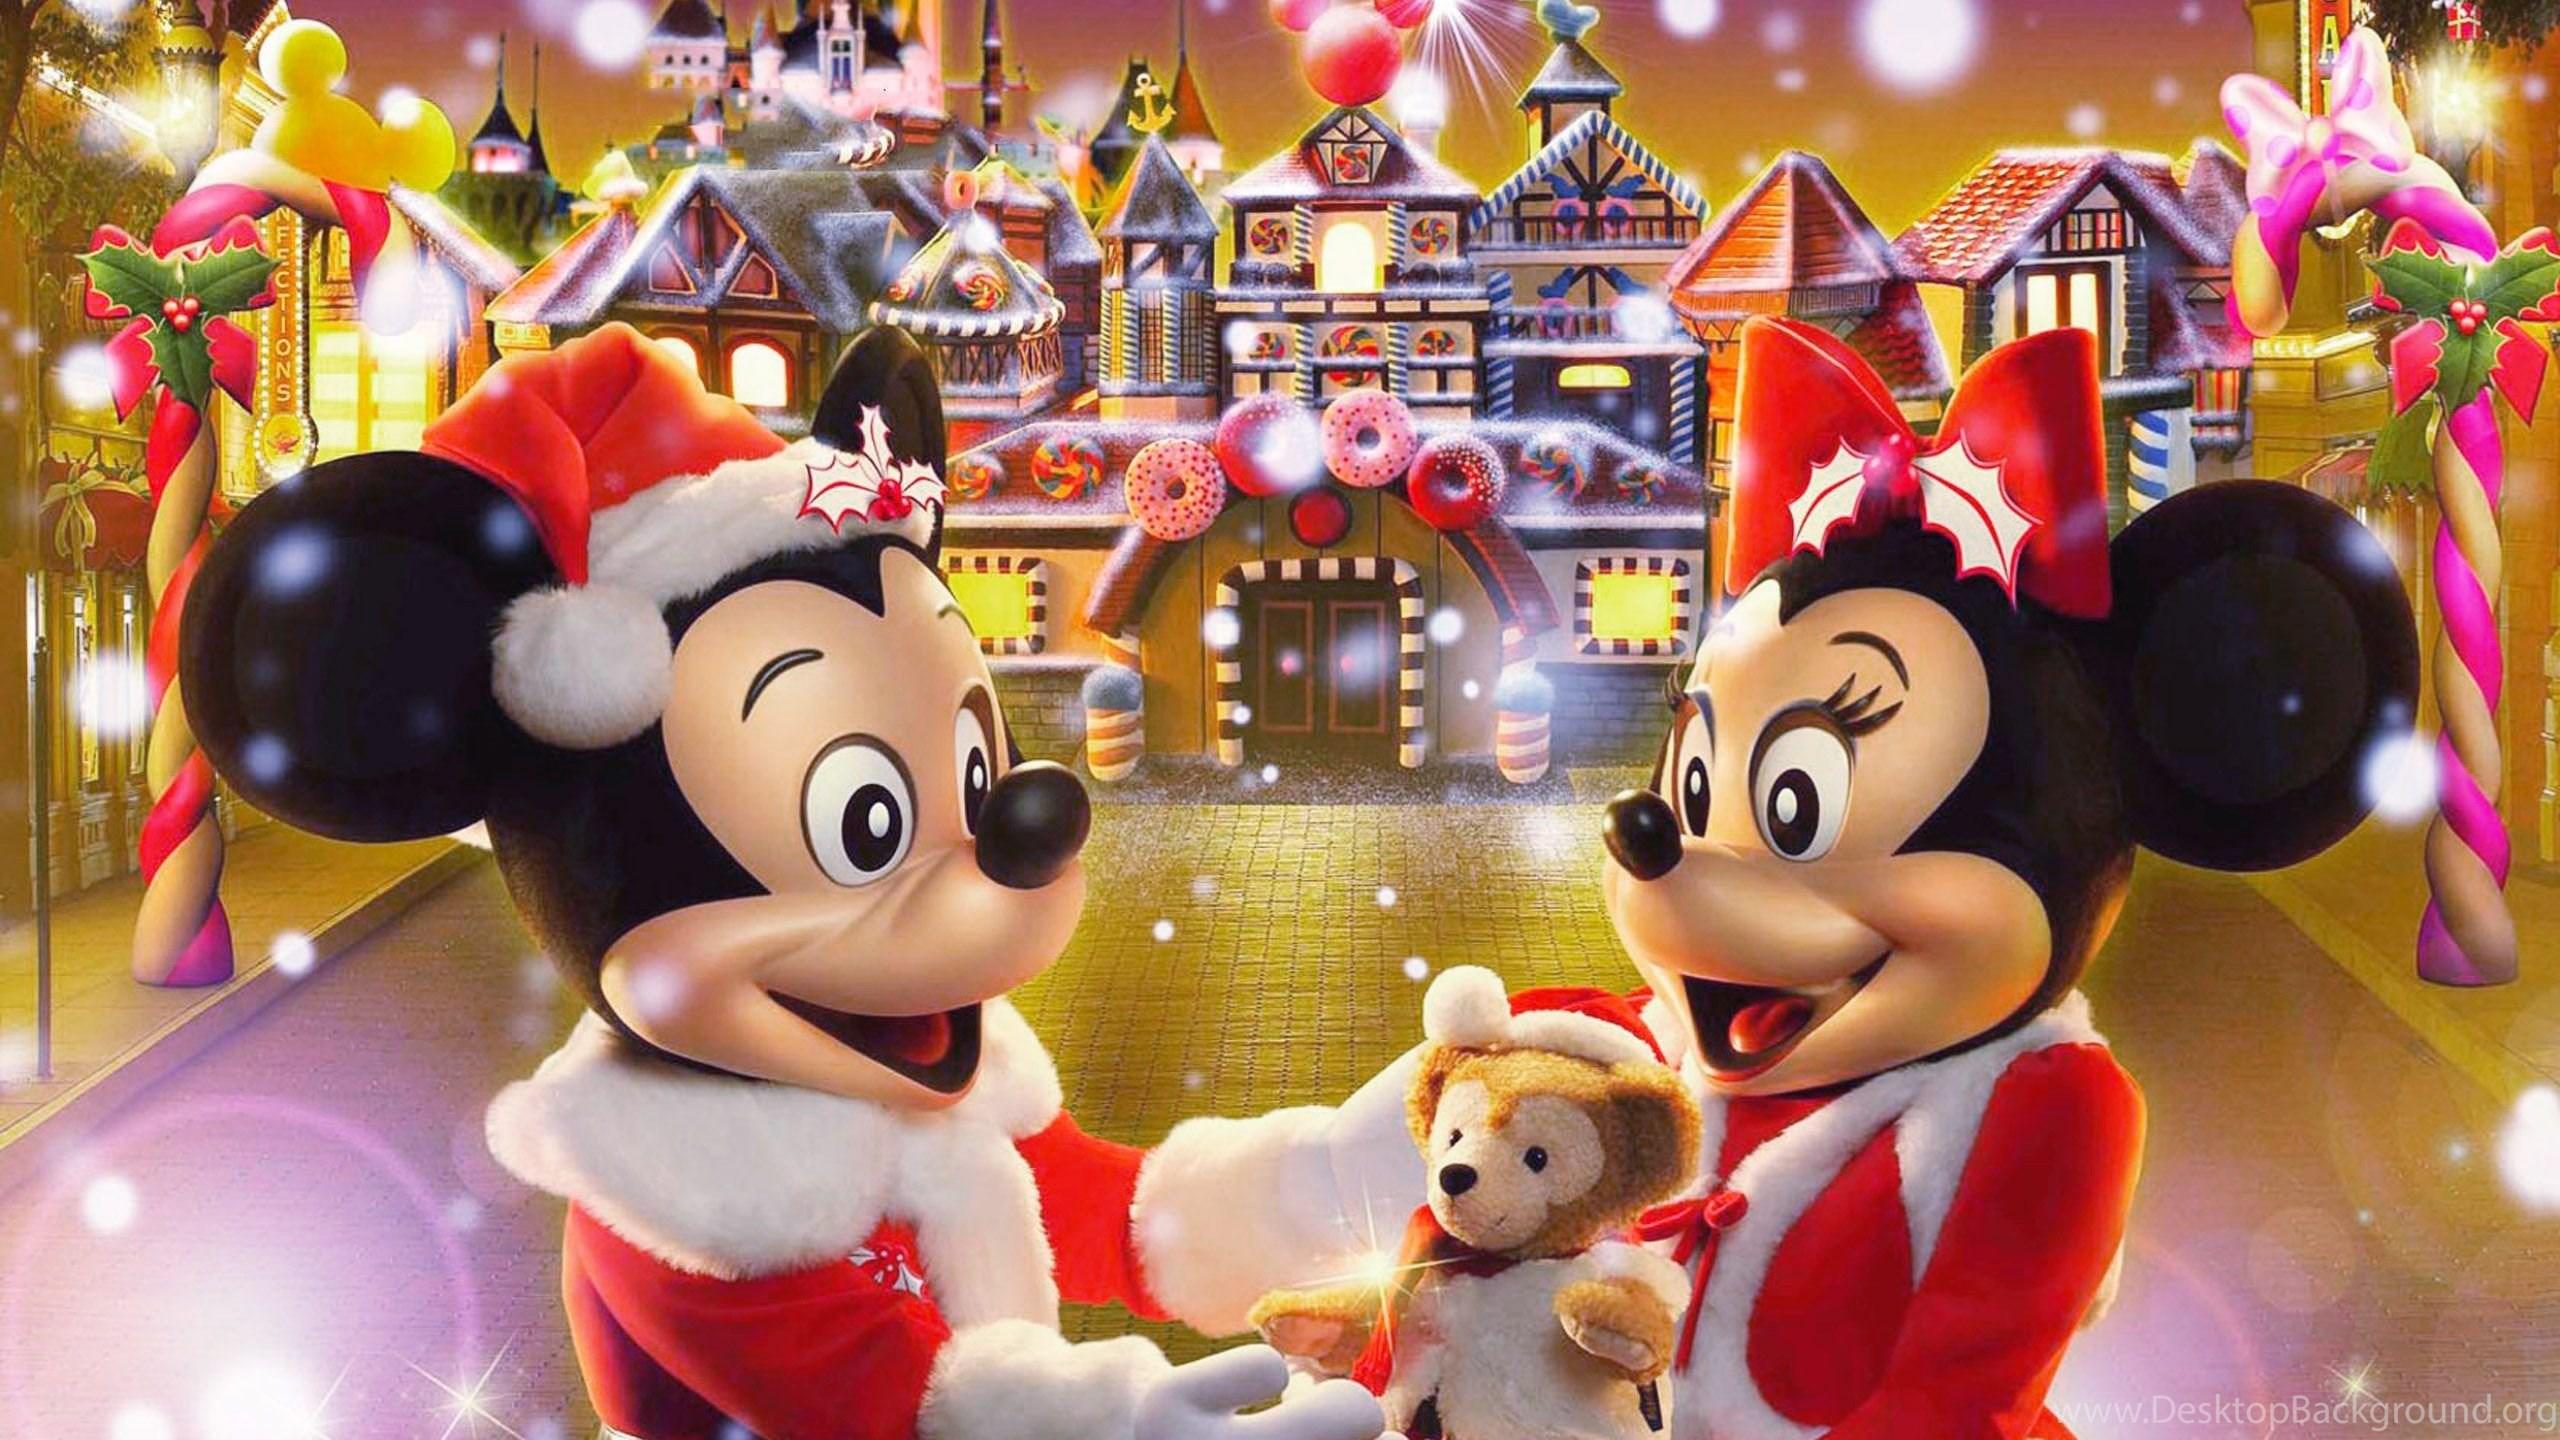 Disney Christmas Wallpapers Free Download Best Hd Desktop